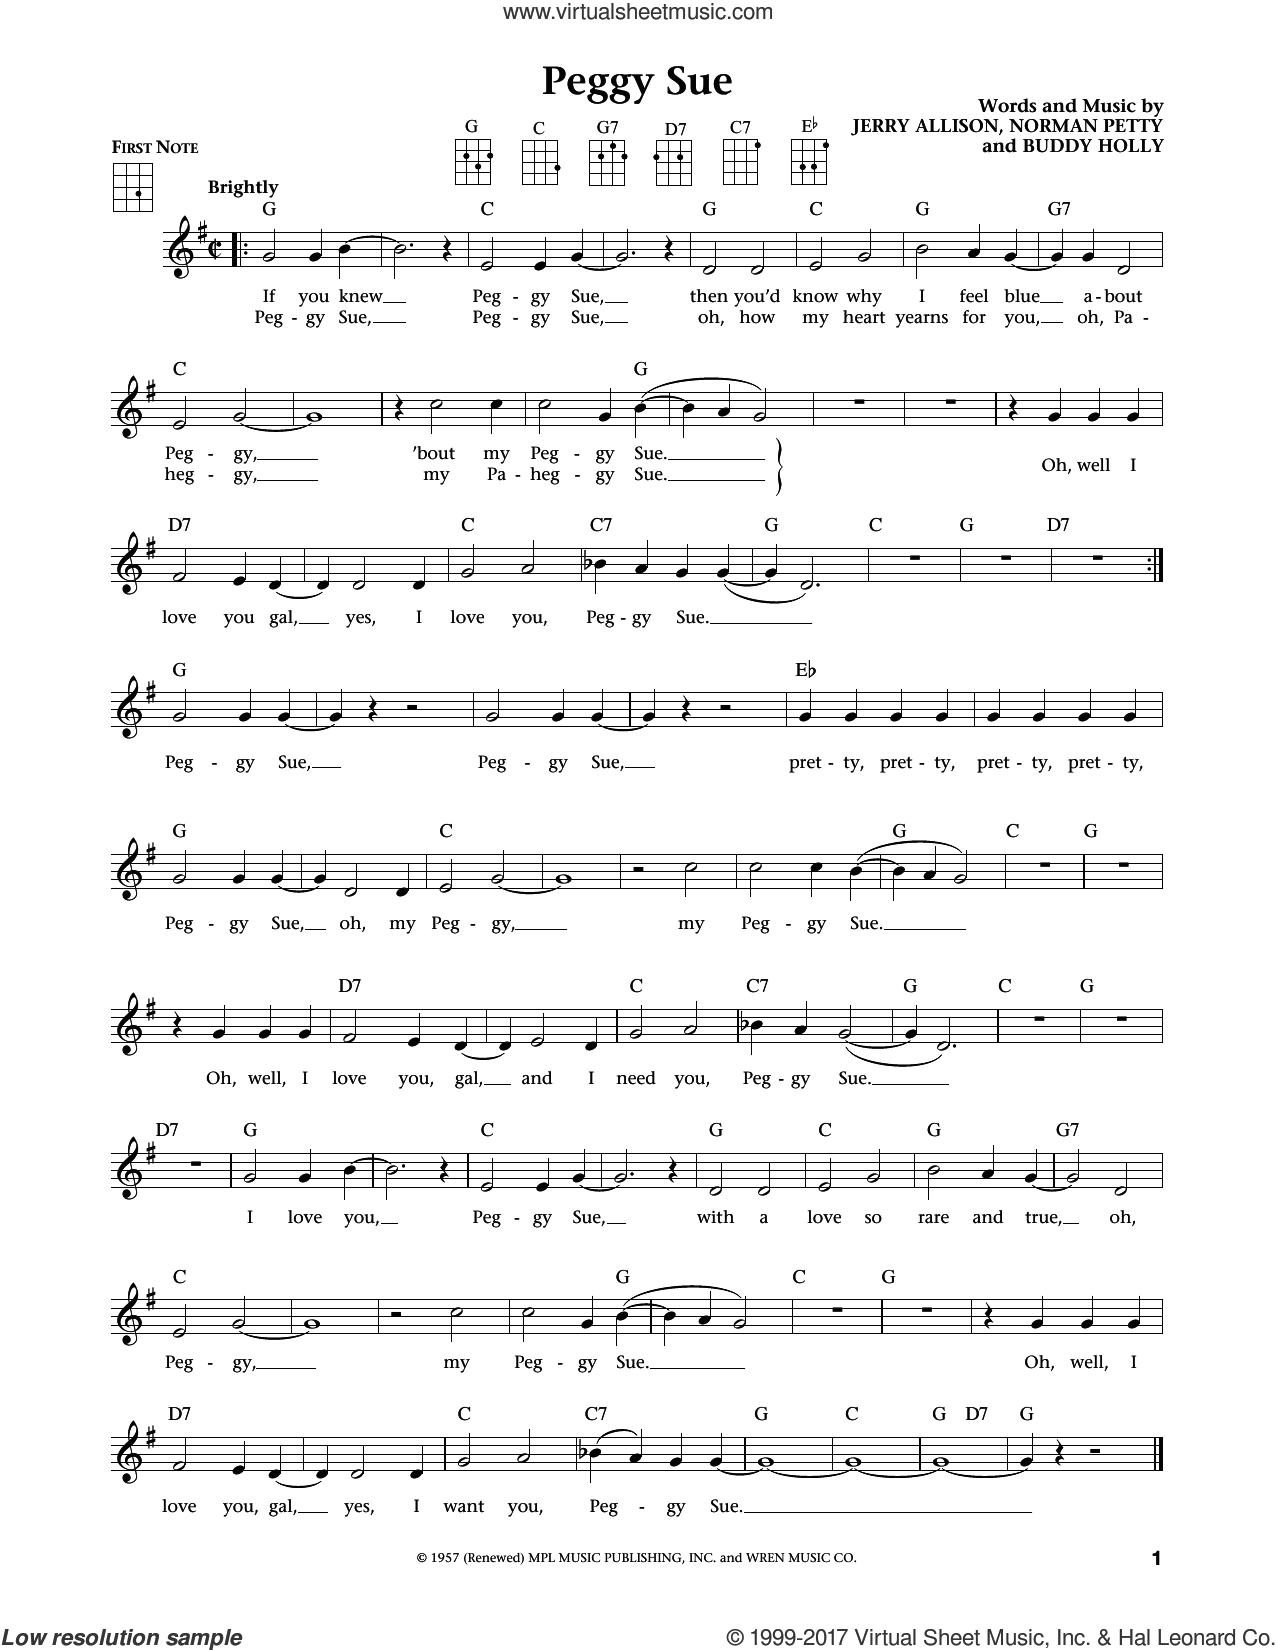 Peggy Sue (from The Daily Ukulele) (arr. Liz and Jim Beloff) sheet music for ukulele by Buddy Holly, Jim Beloff, Liz Beloff, Jerry Allison and Norman Petty, intermediate skill level